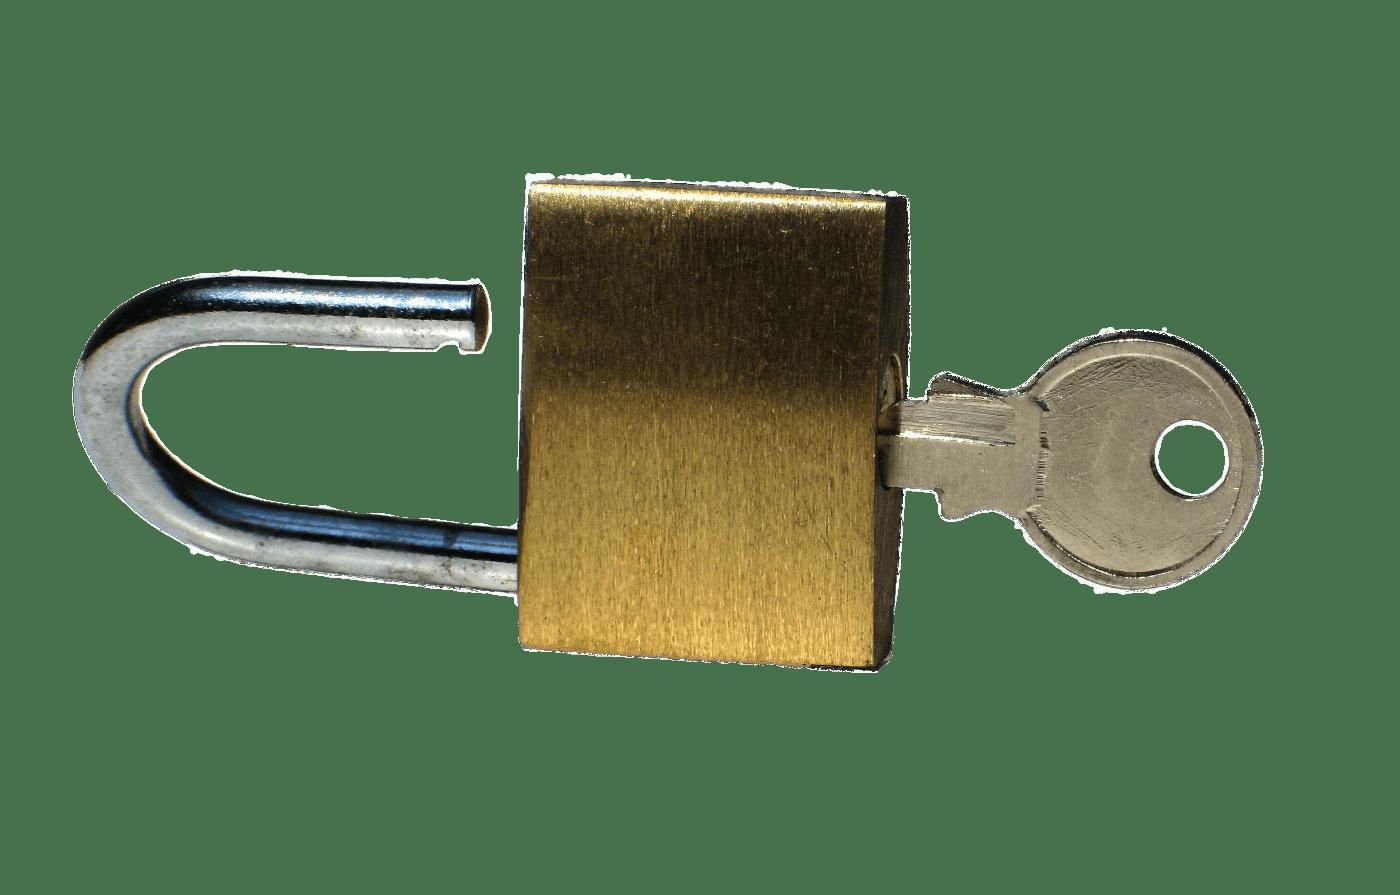 Open padlock transparent png. Lock clipart lock and key